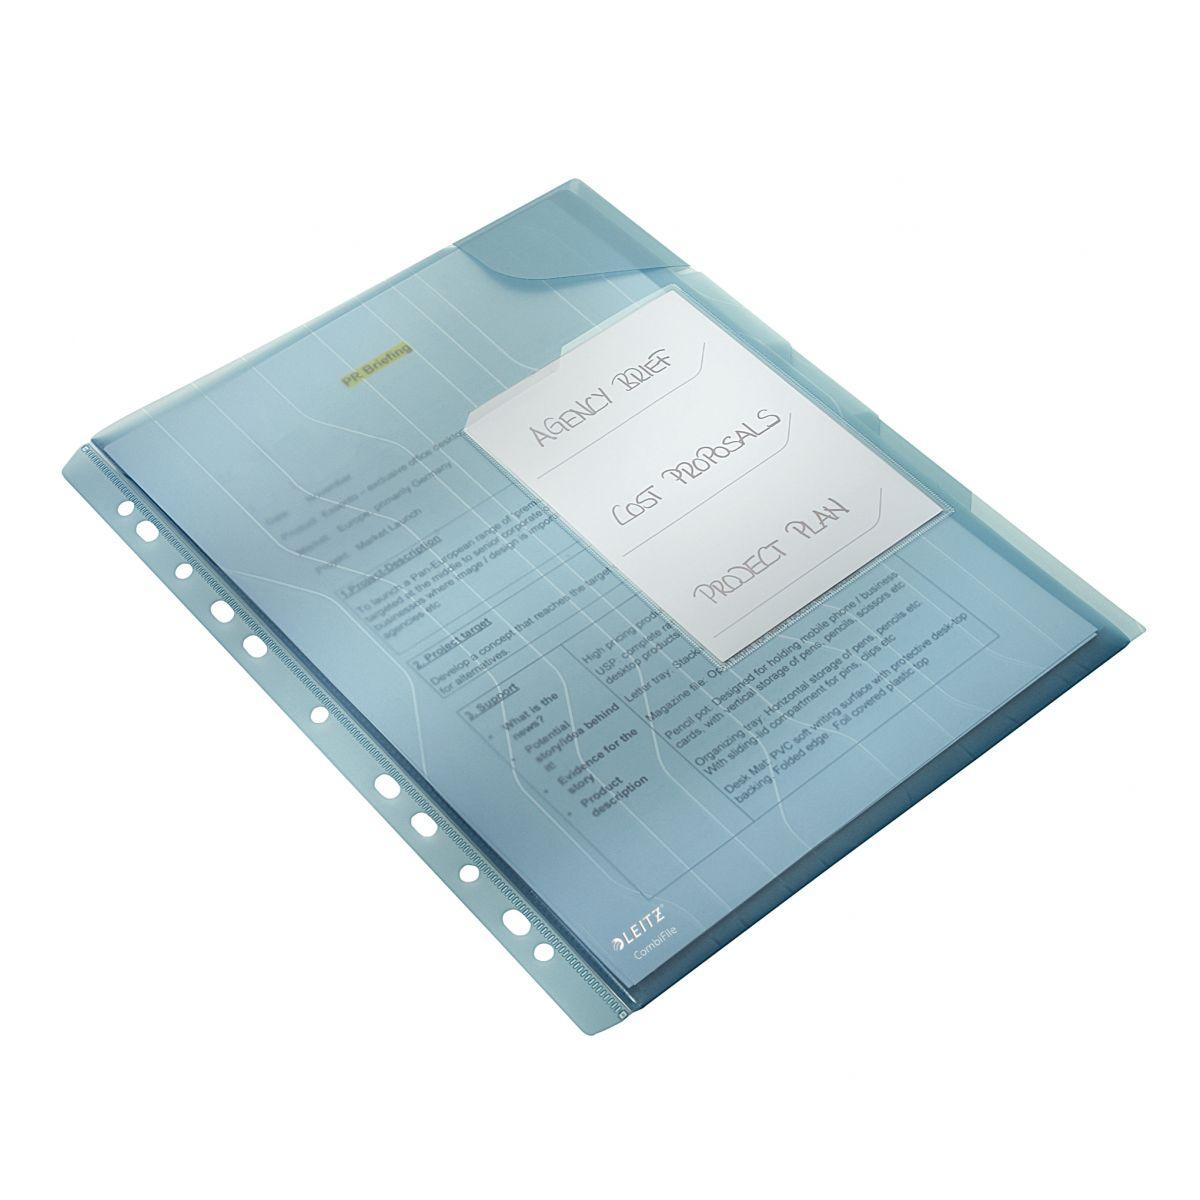 Pasta Organizadora CombiFile Esselte - Capacidade: 3 x 20 fls (3 unidades), Cor: Azul, Cod: 63485